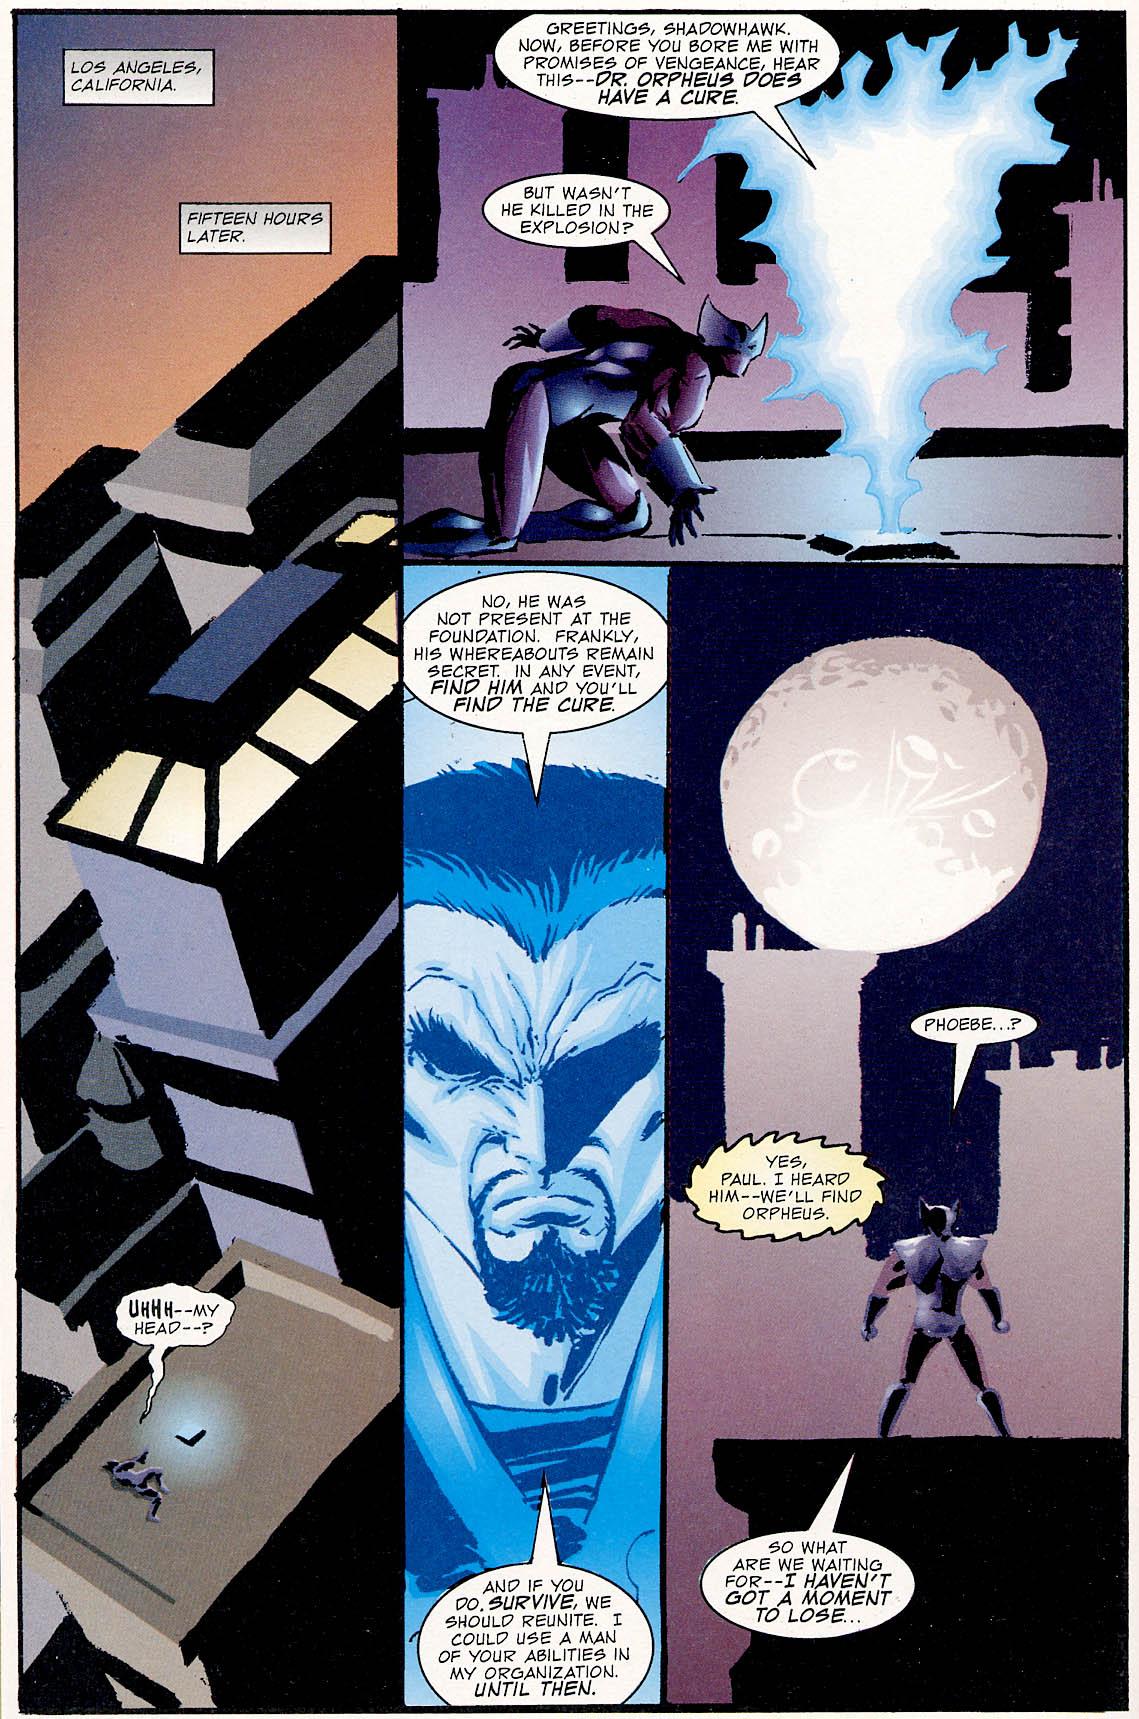 Read online ShadowHawk comic -  Issue #0 - 20